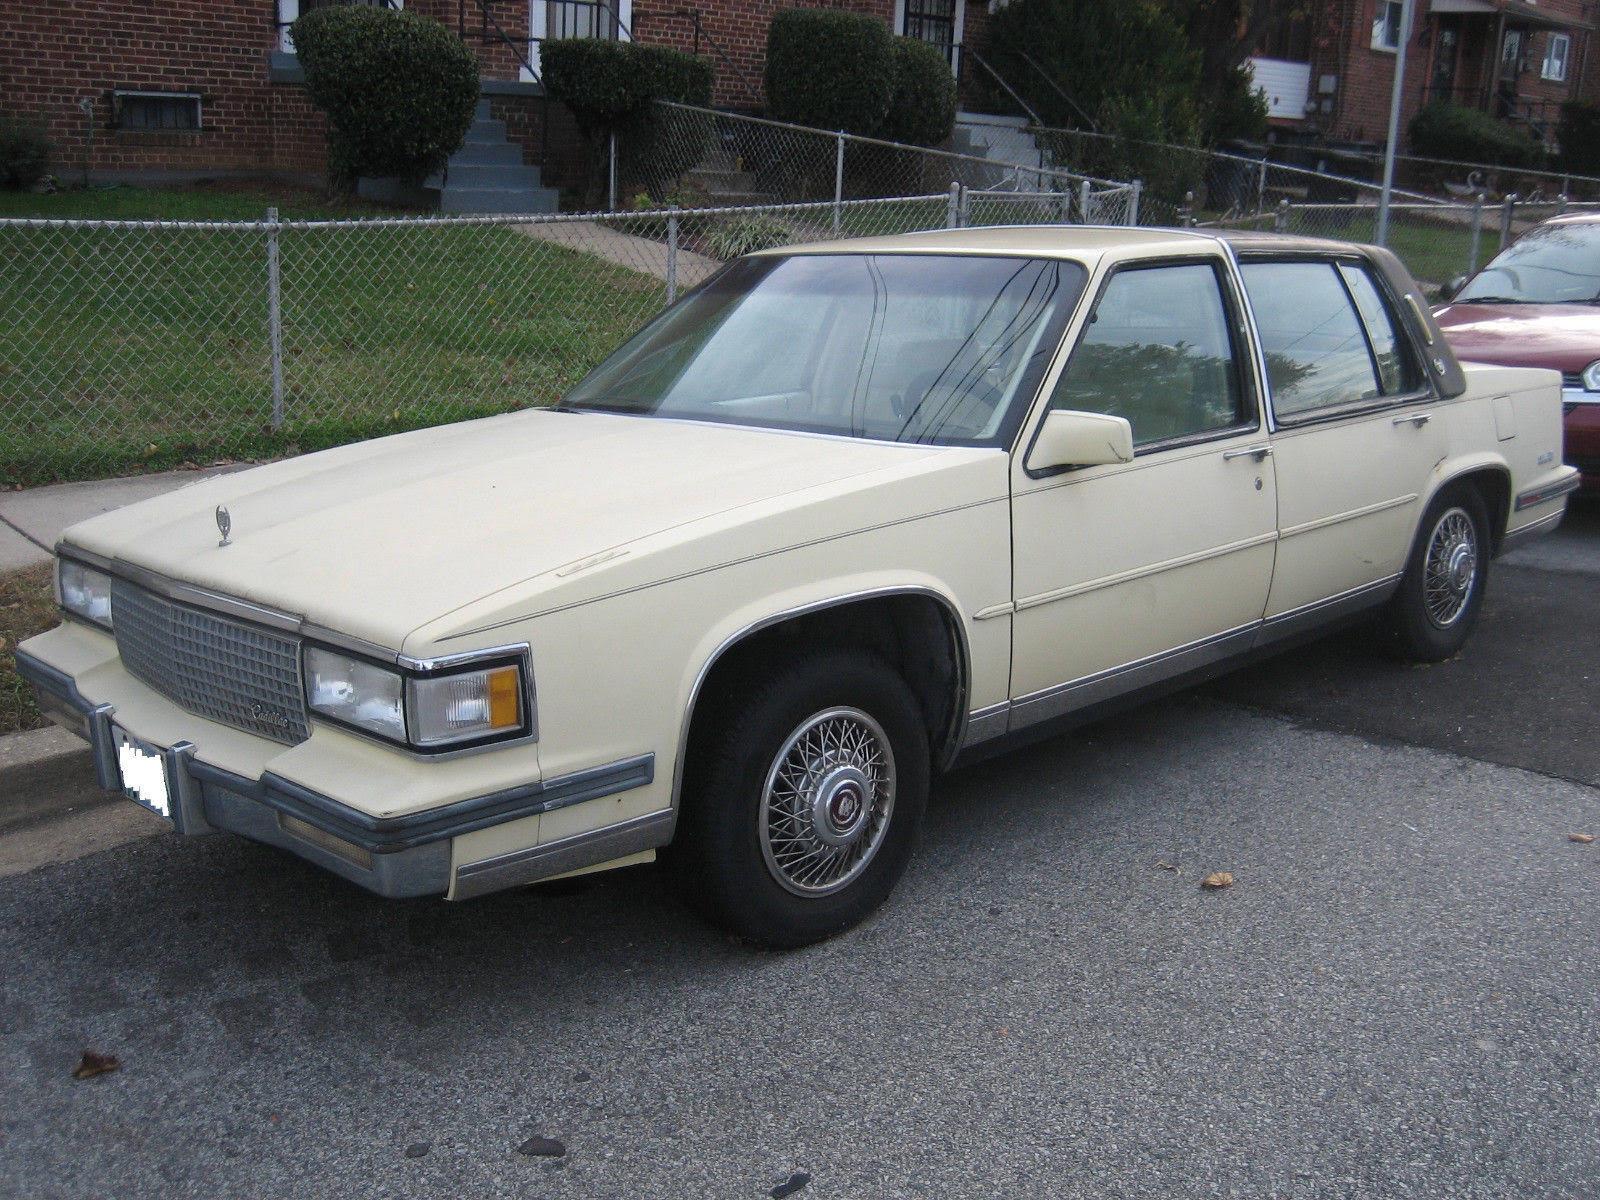 1988 Cadillac DeVille Sedan 1988 Cadillac Sedan DeVille (Vintage) 1 Owner NO RESERVE RUNS WELL